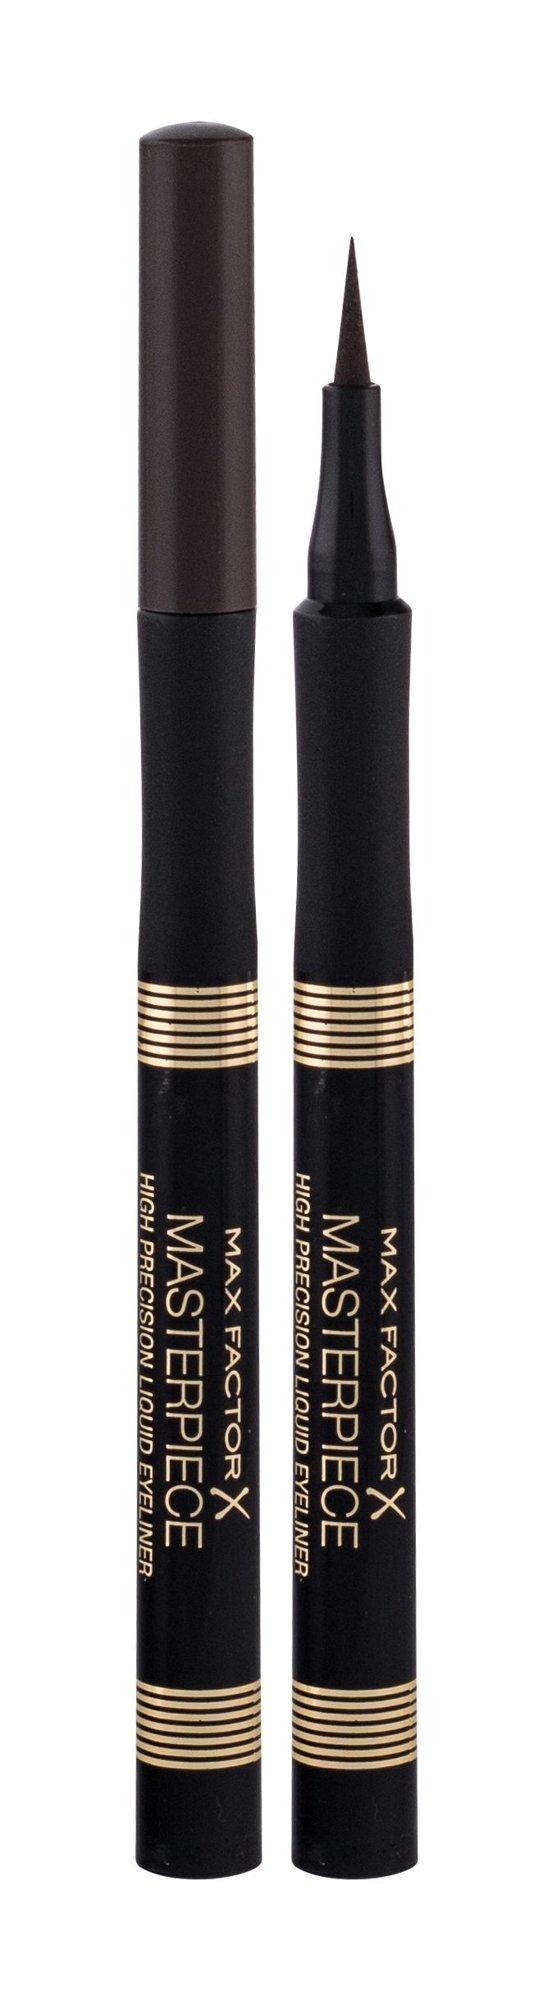 Max Factor Masterpiece Eye Line 1ml 10 Chocolat